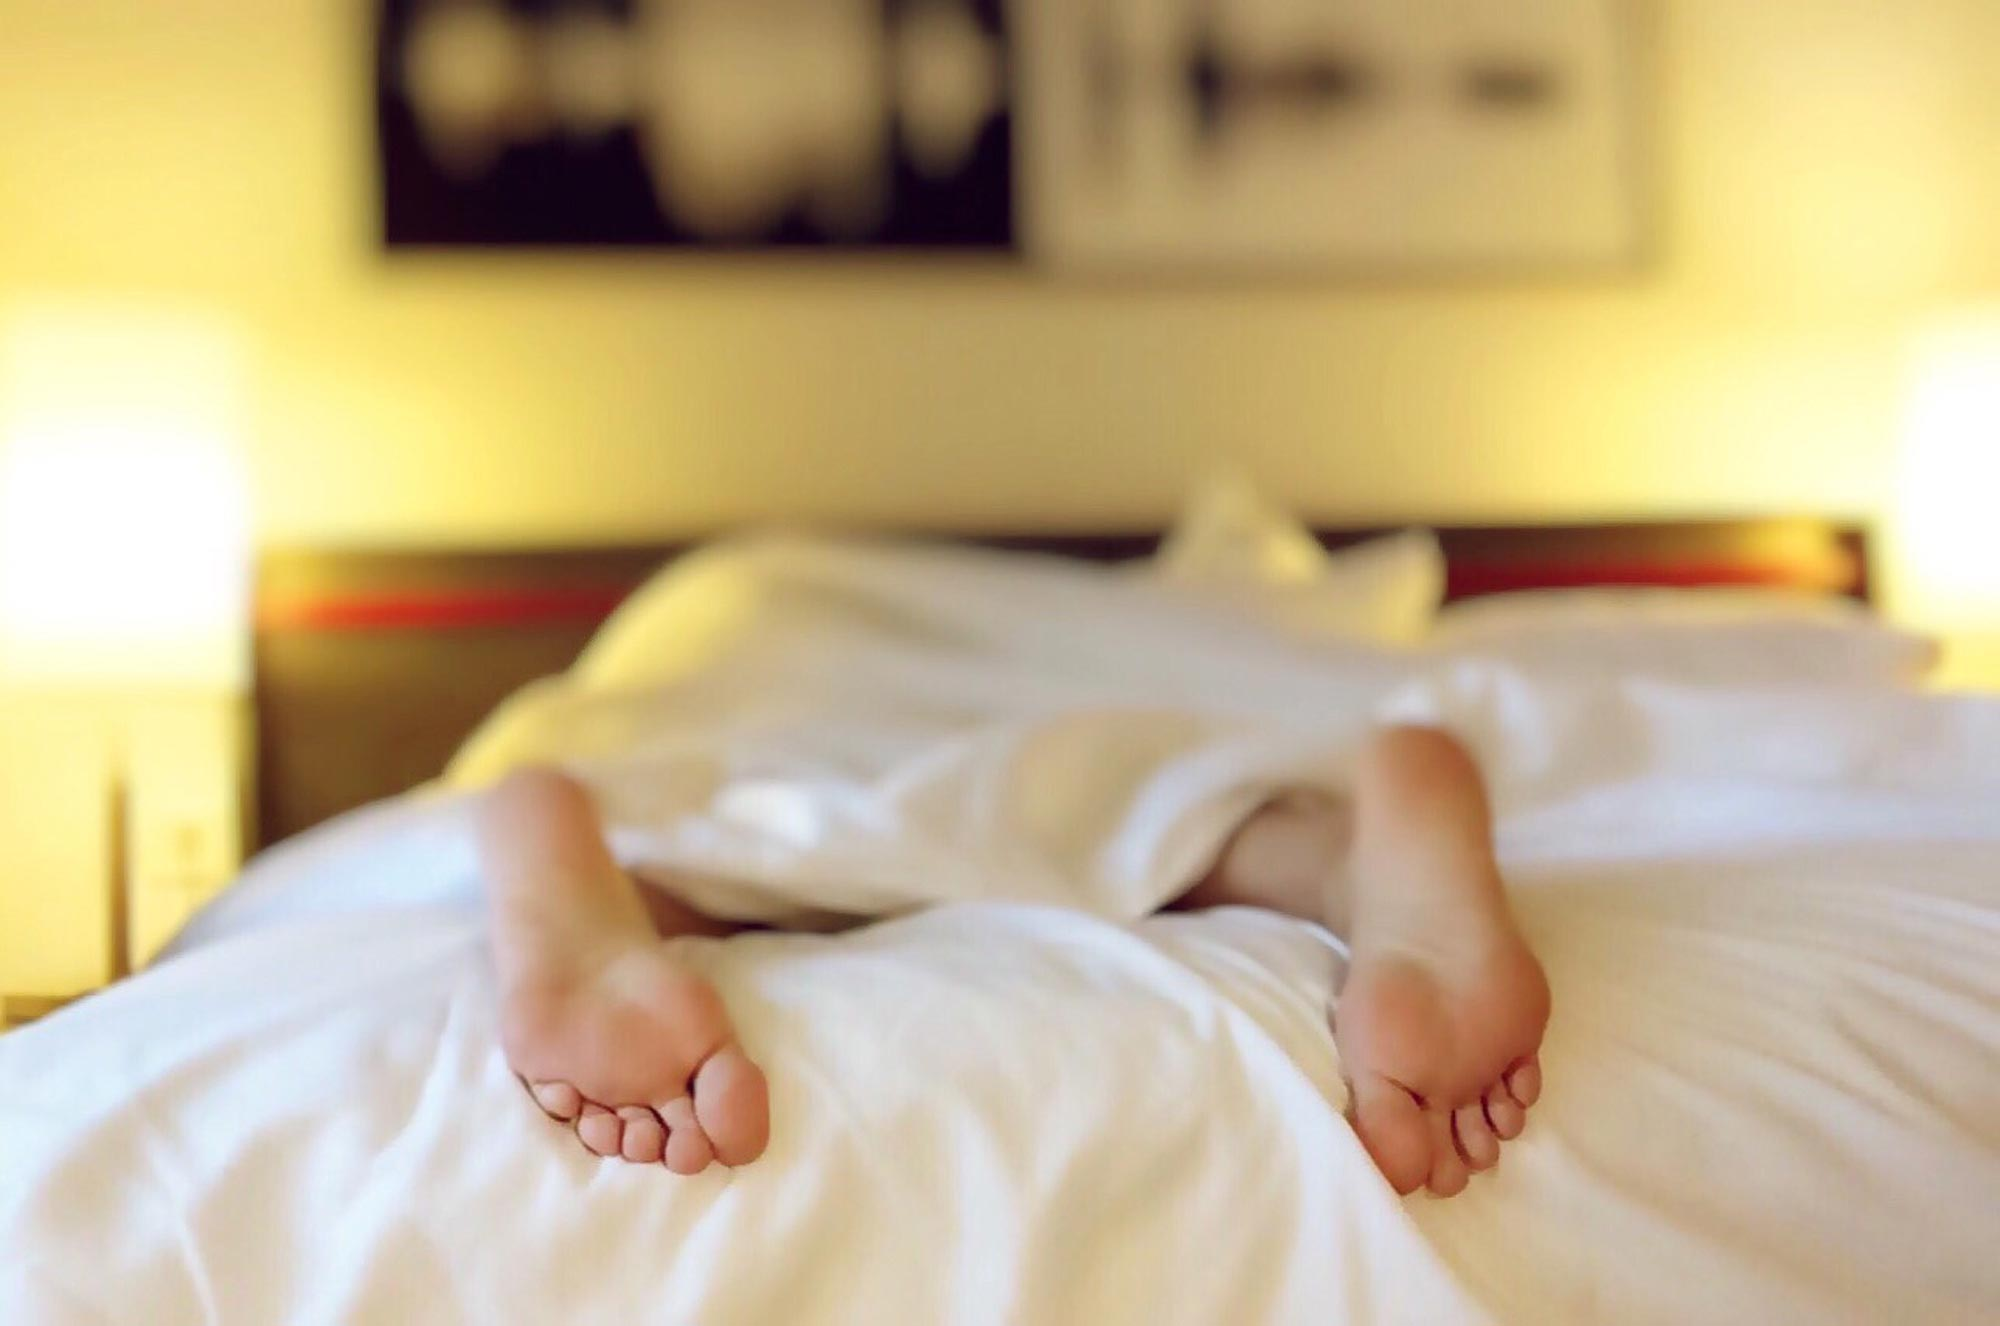 Getting a good night's sleep is crucial during the coronavirus lockdown